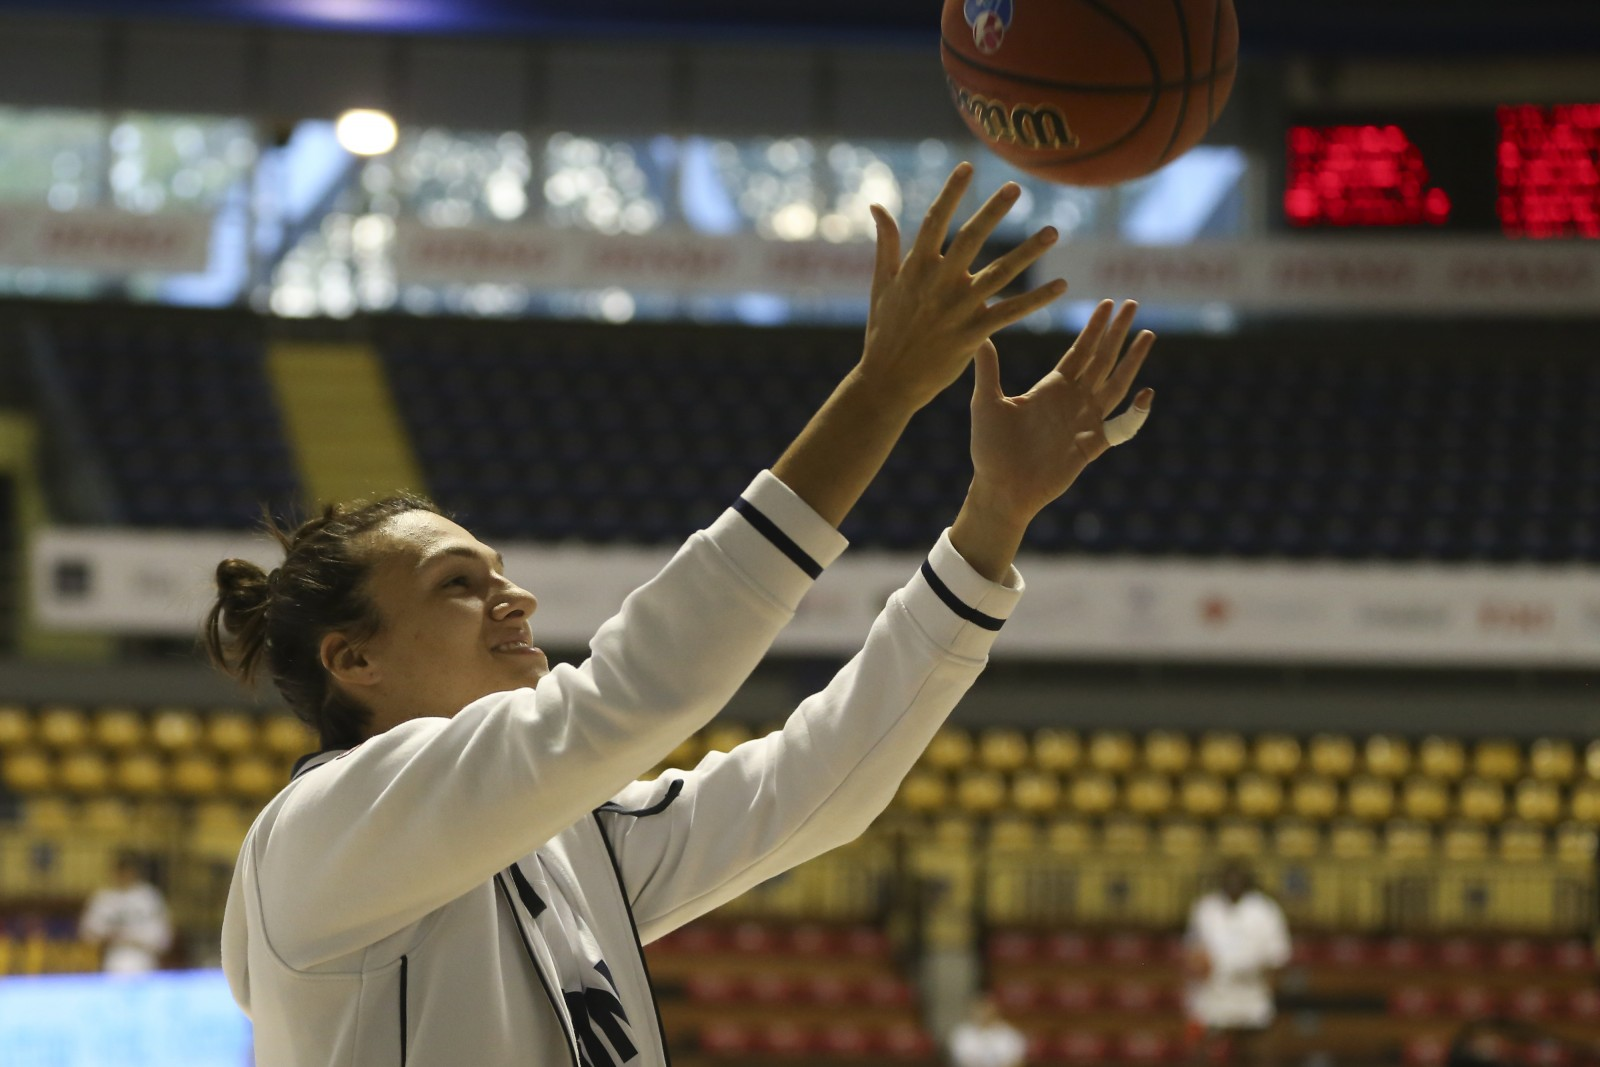 Serie A1: Iren Fixi Pallacanestro Torino - Basket Femminile Le Mura Lucca